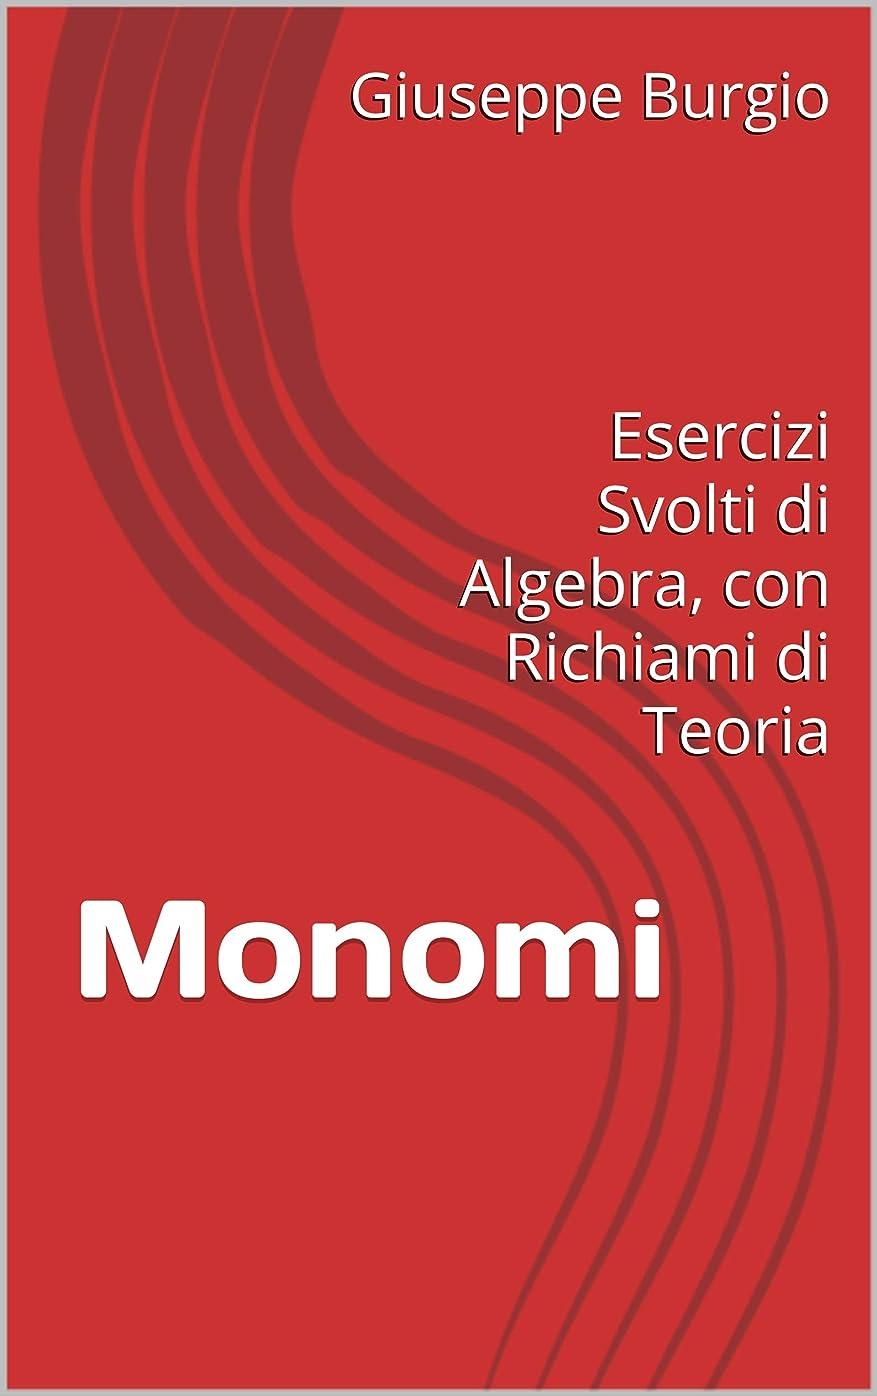 酔っ払い斧拮抗Monomi: Esercizi Svolti di Algebra, con Richiami di Teoria (Algebra per le Scuole Superiori) (Italian Edition)